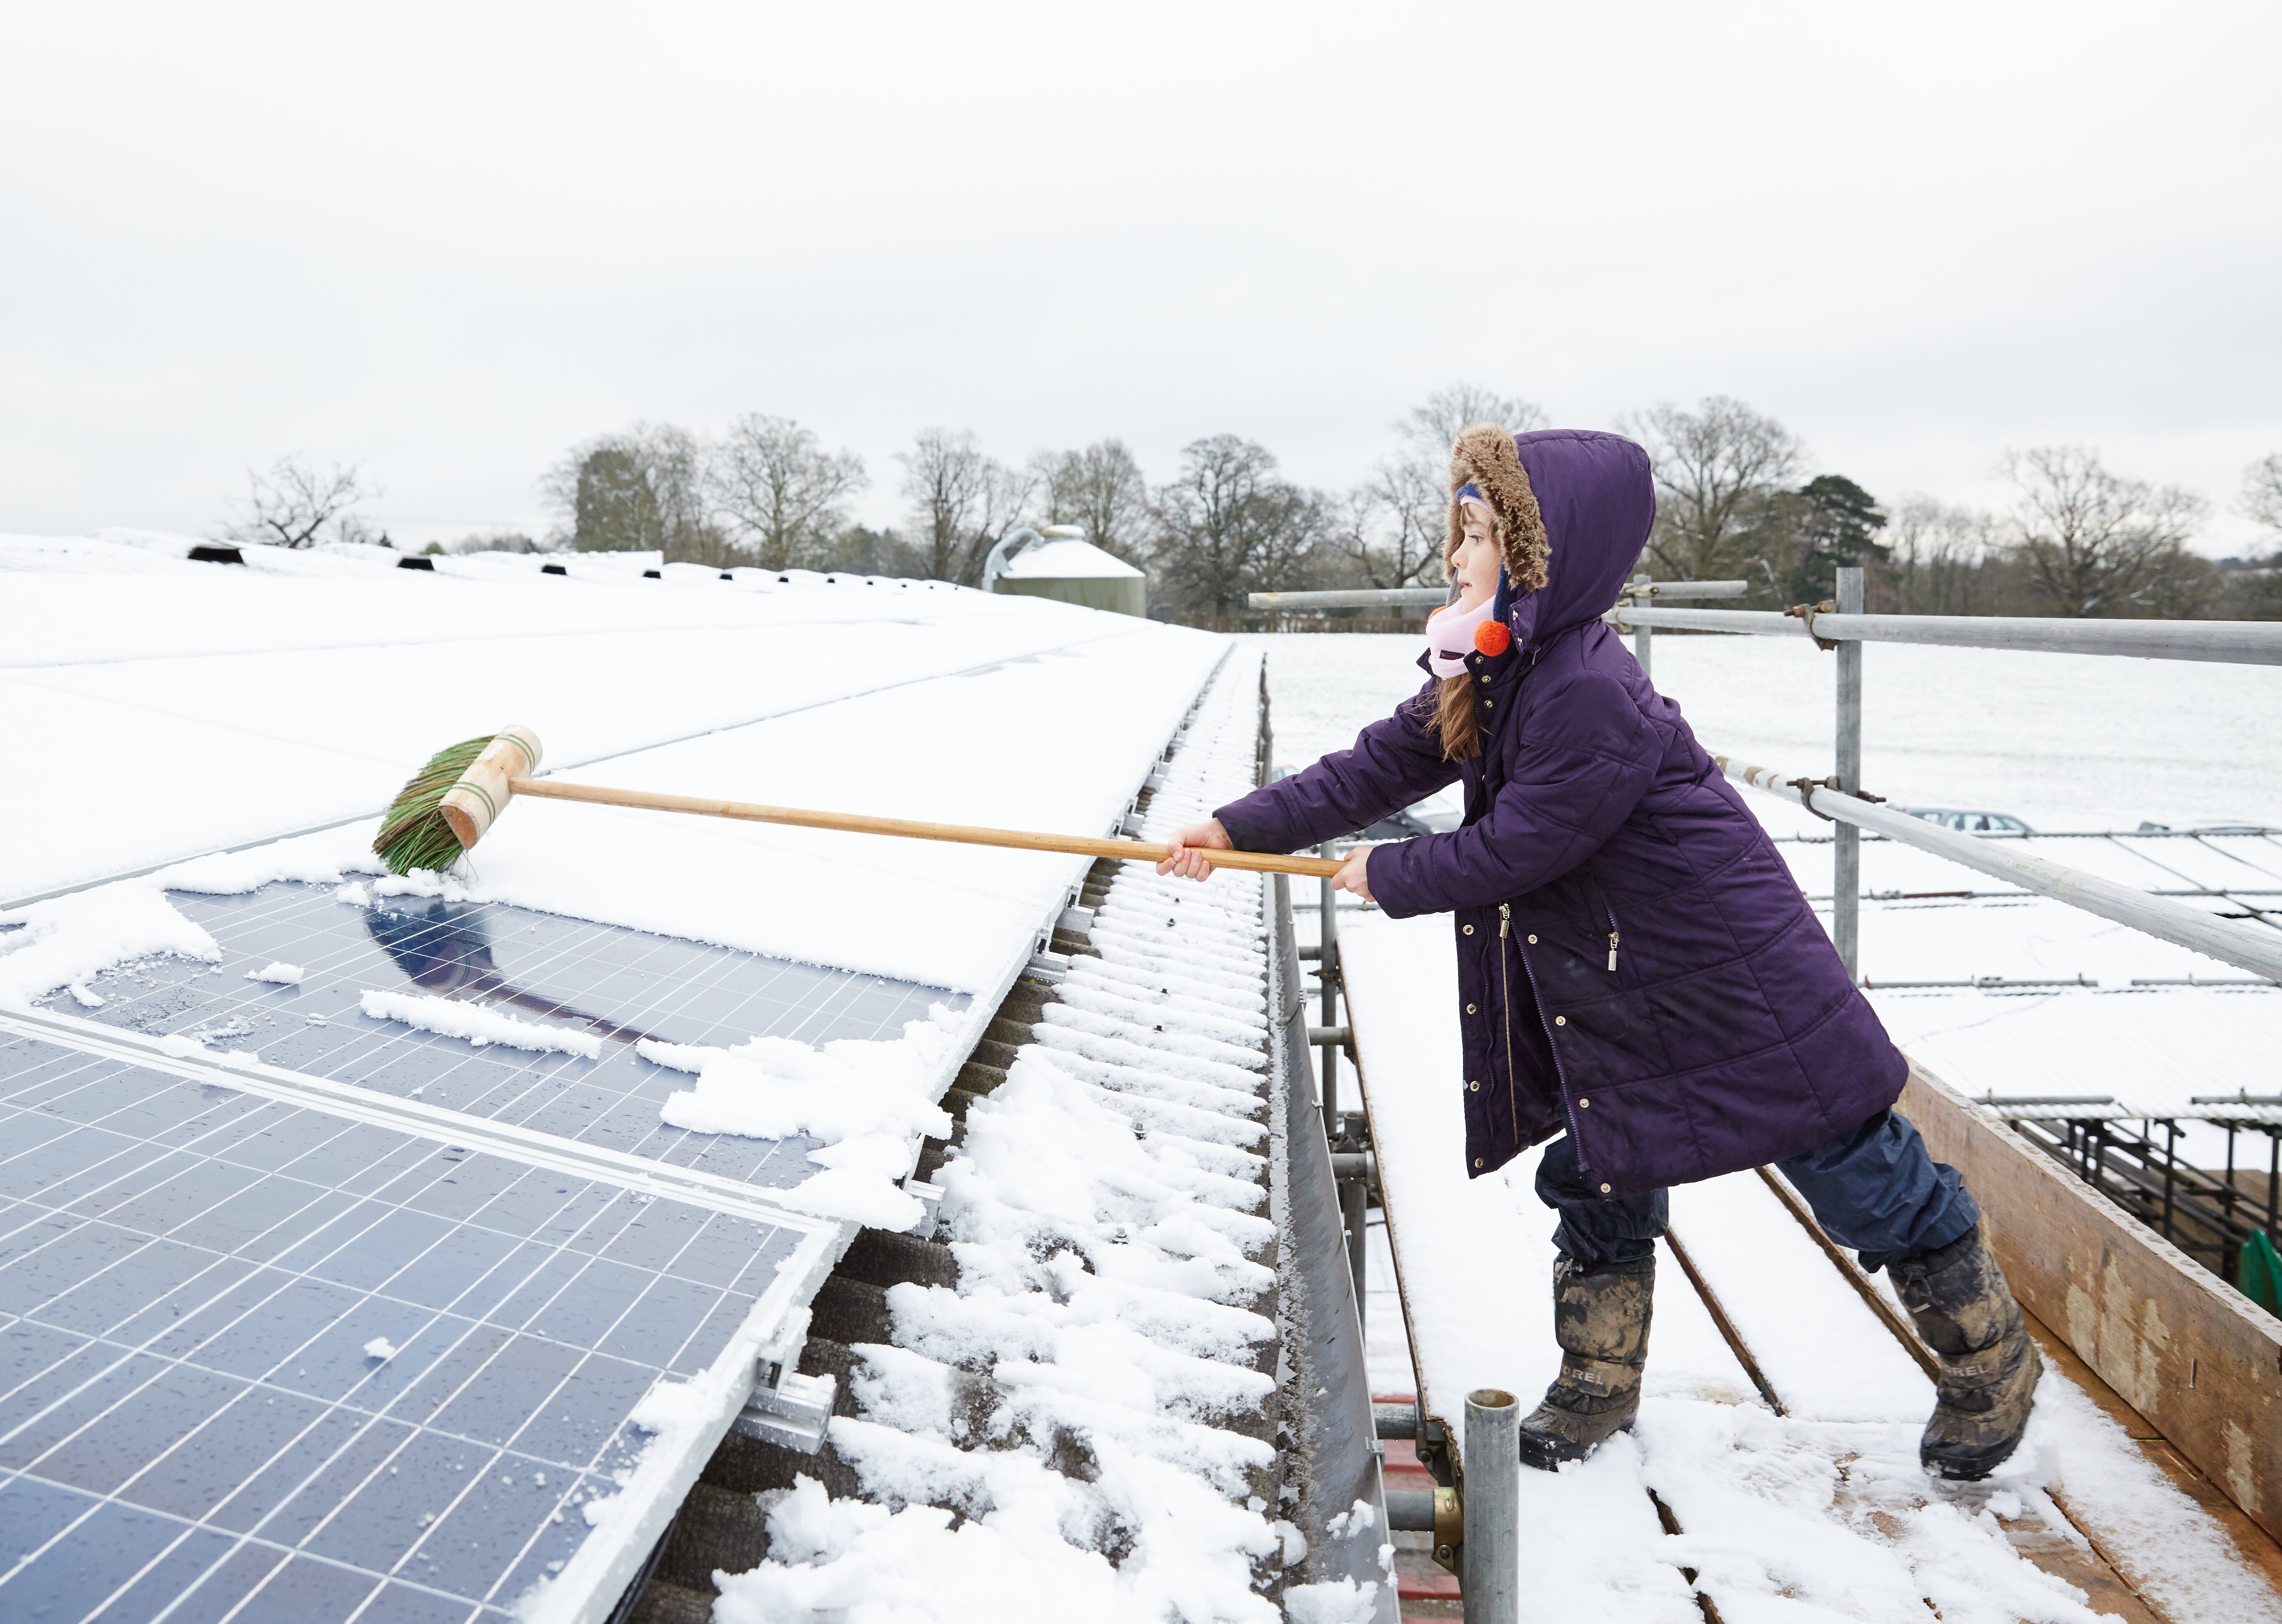 Niña limpiando paneles solares fotovoltaicos de la nieve en Grange Farm, Balcombe, Reino Unido. Foto: Balcombe.